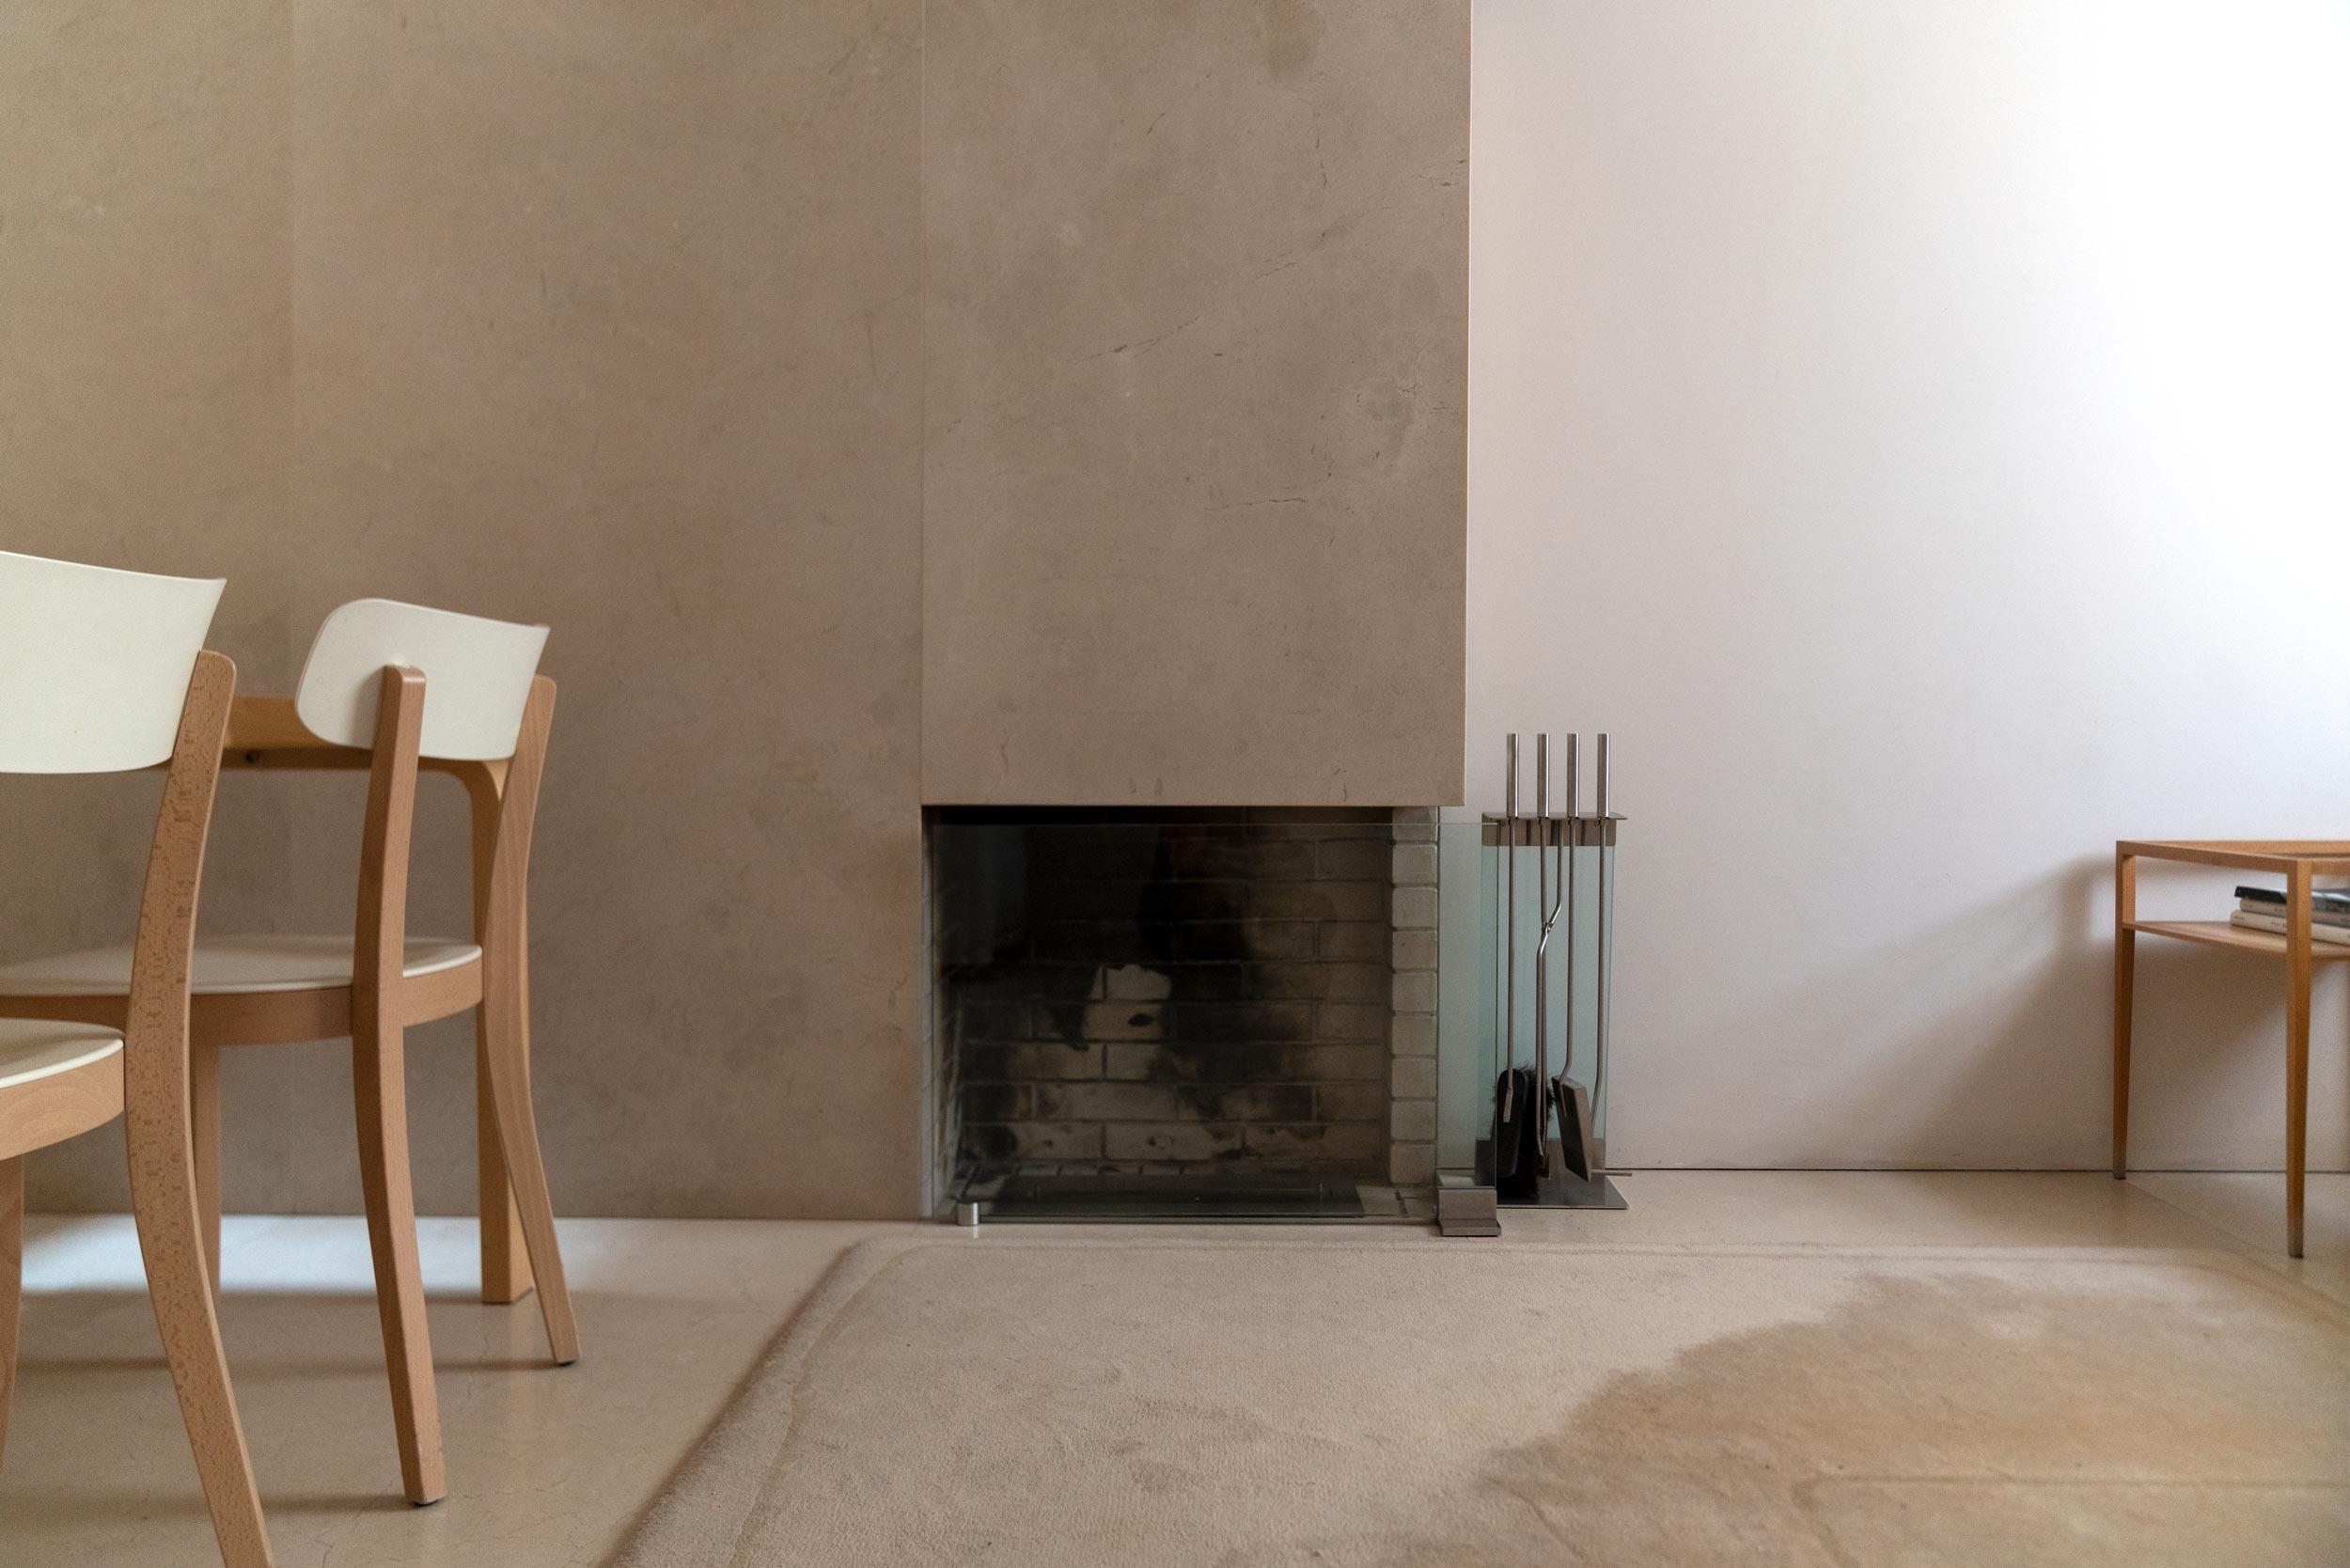 Fiona-Burrage-casa-1015-porto-norwich-photographer-fireplace.jpg